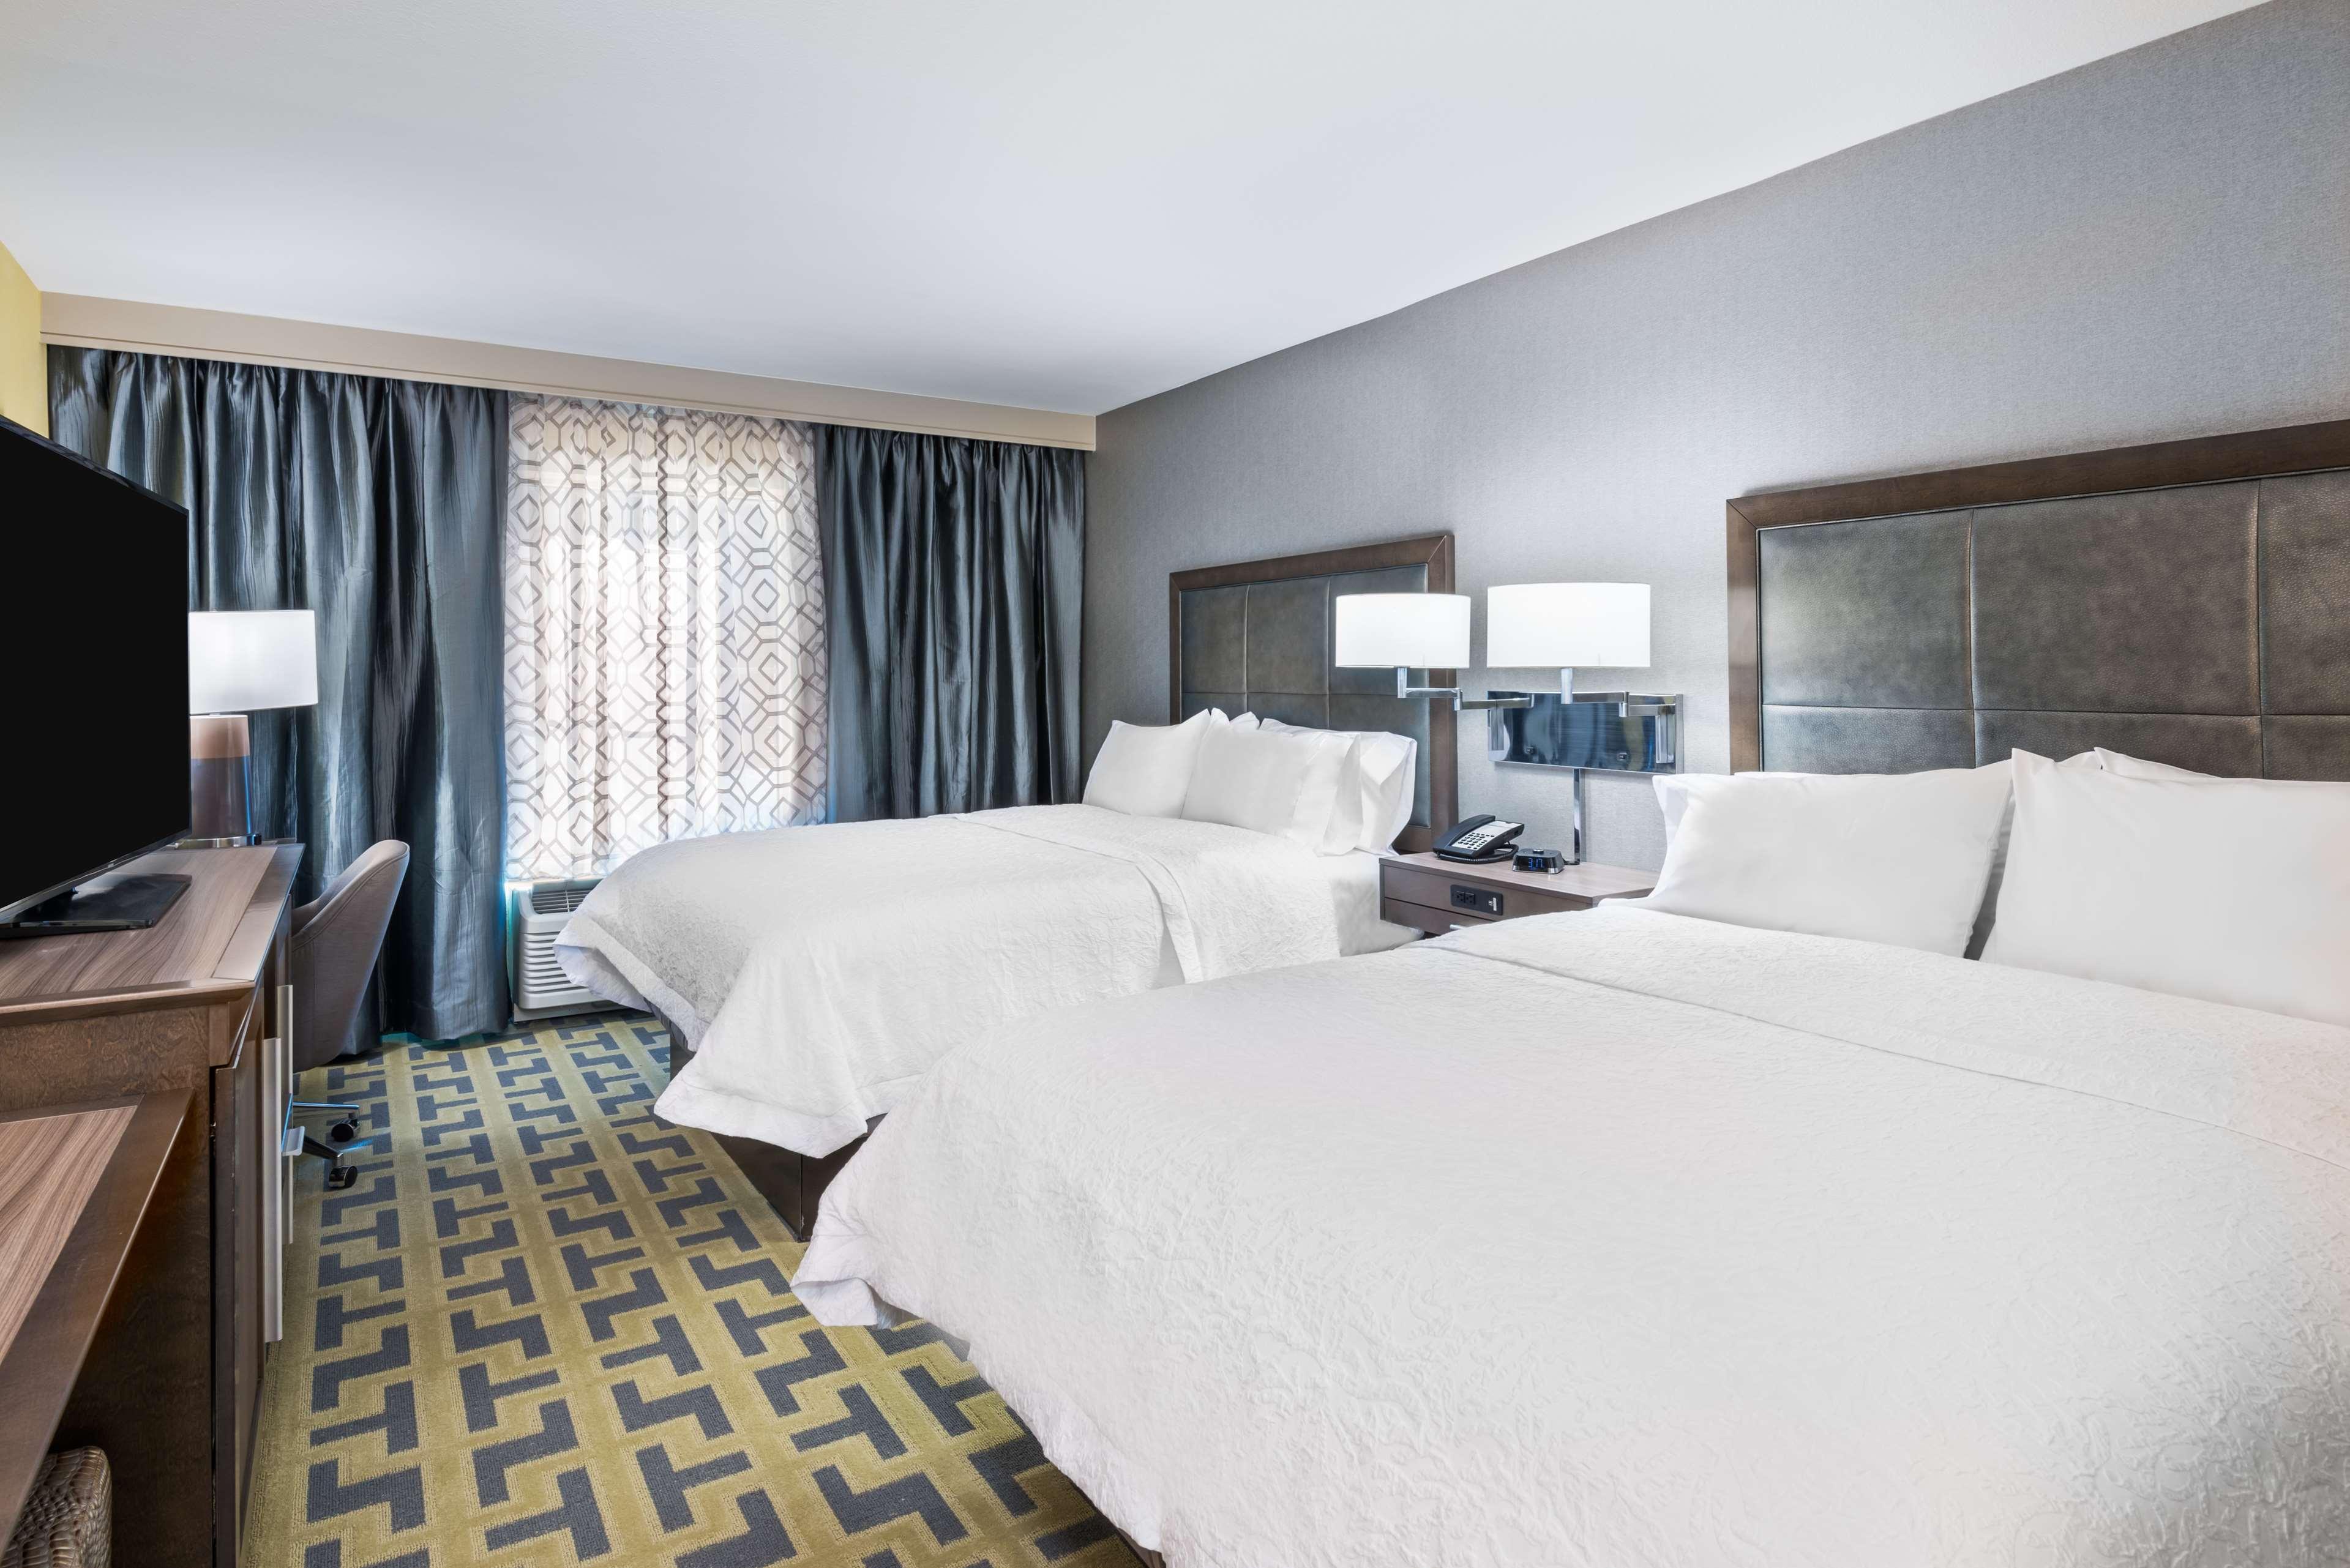 Hampton Inn & Suites Tampa Airport Avion Park Westshore image 17